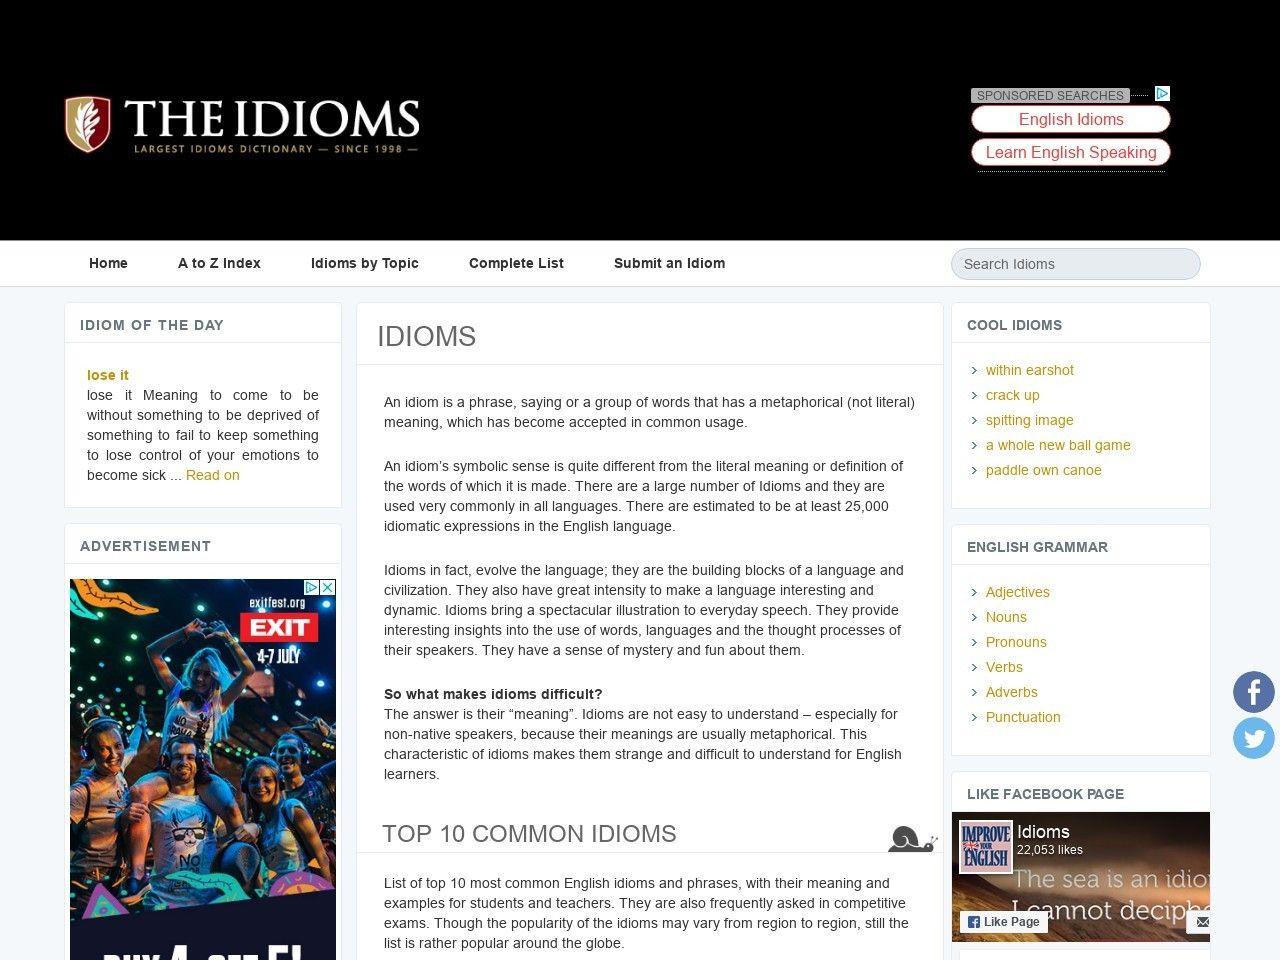 Theidioms